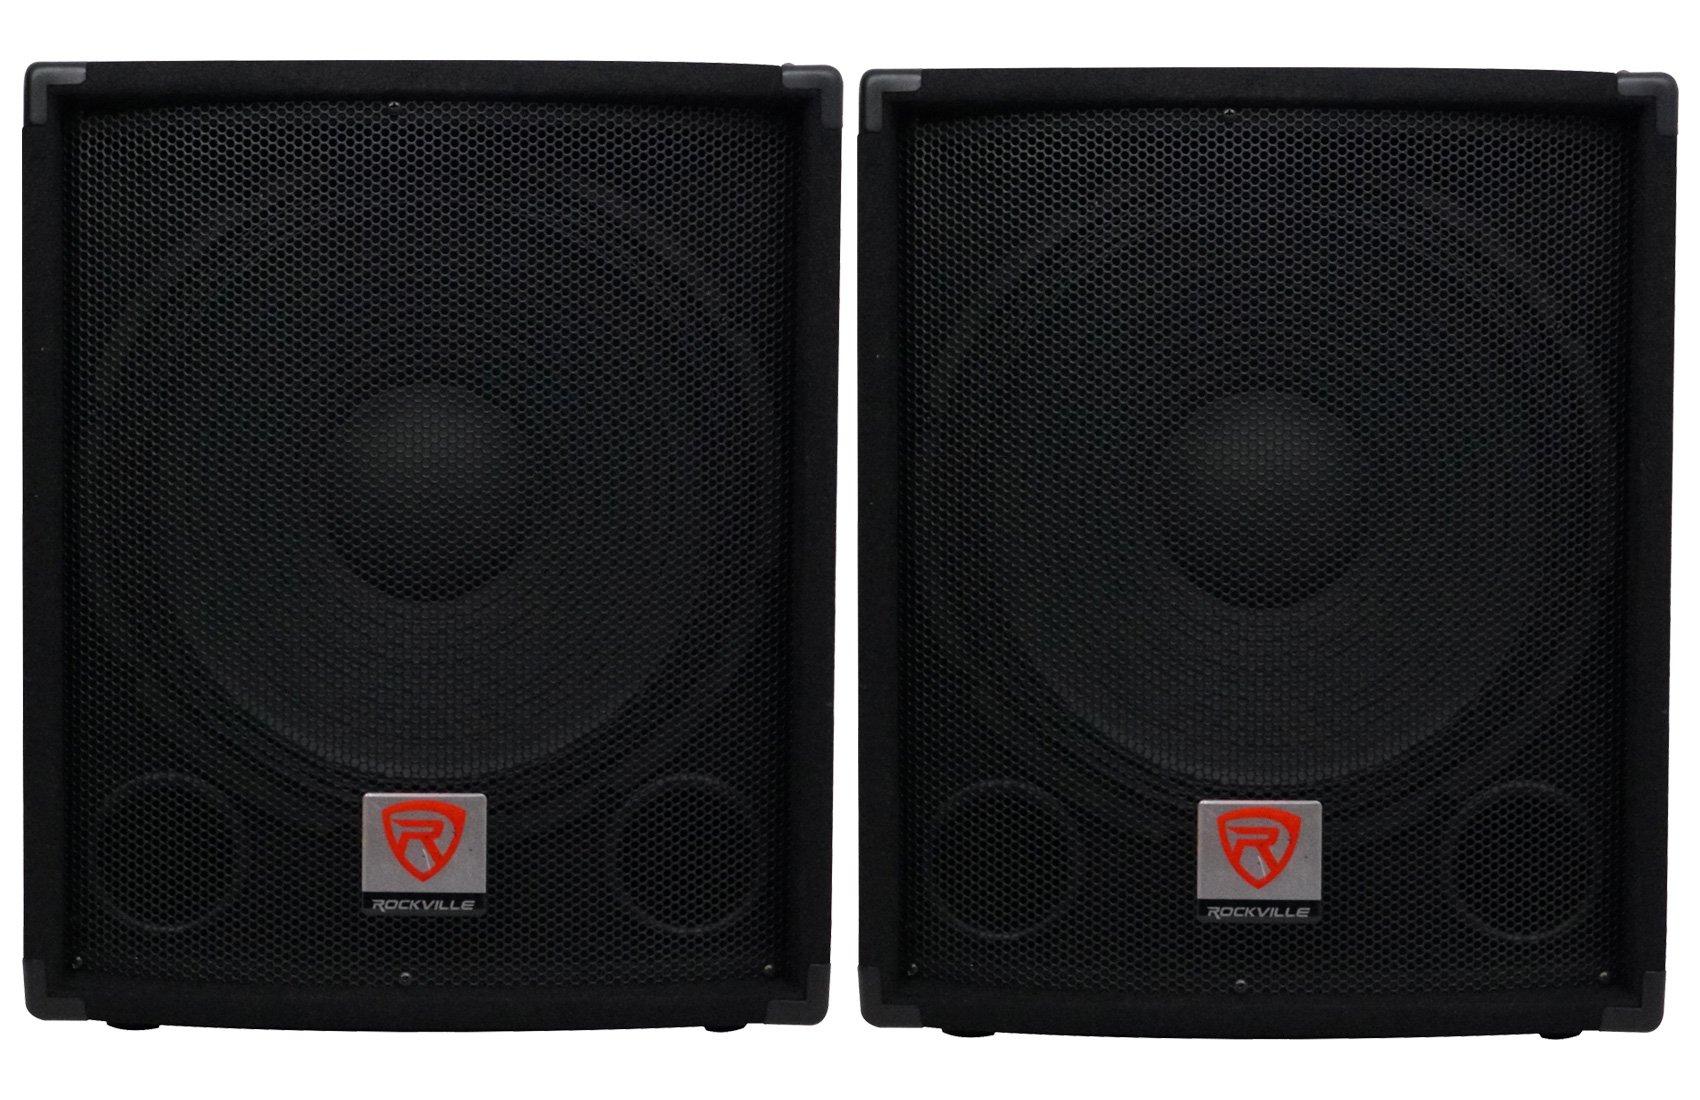 (2) Rockville SBG1154 15'' Passive Pro DJ Subwoofers Totaling 1600 Watt w/ MDF Cabinet, Molded Steel Grill, and Pole Mount